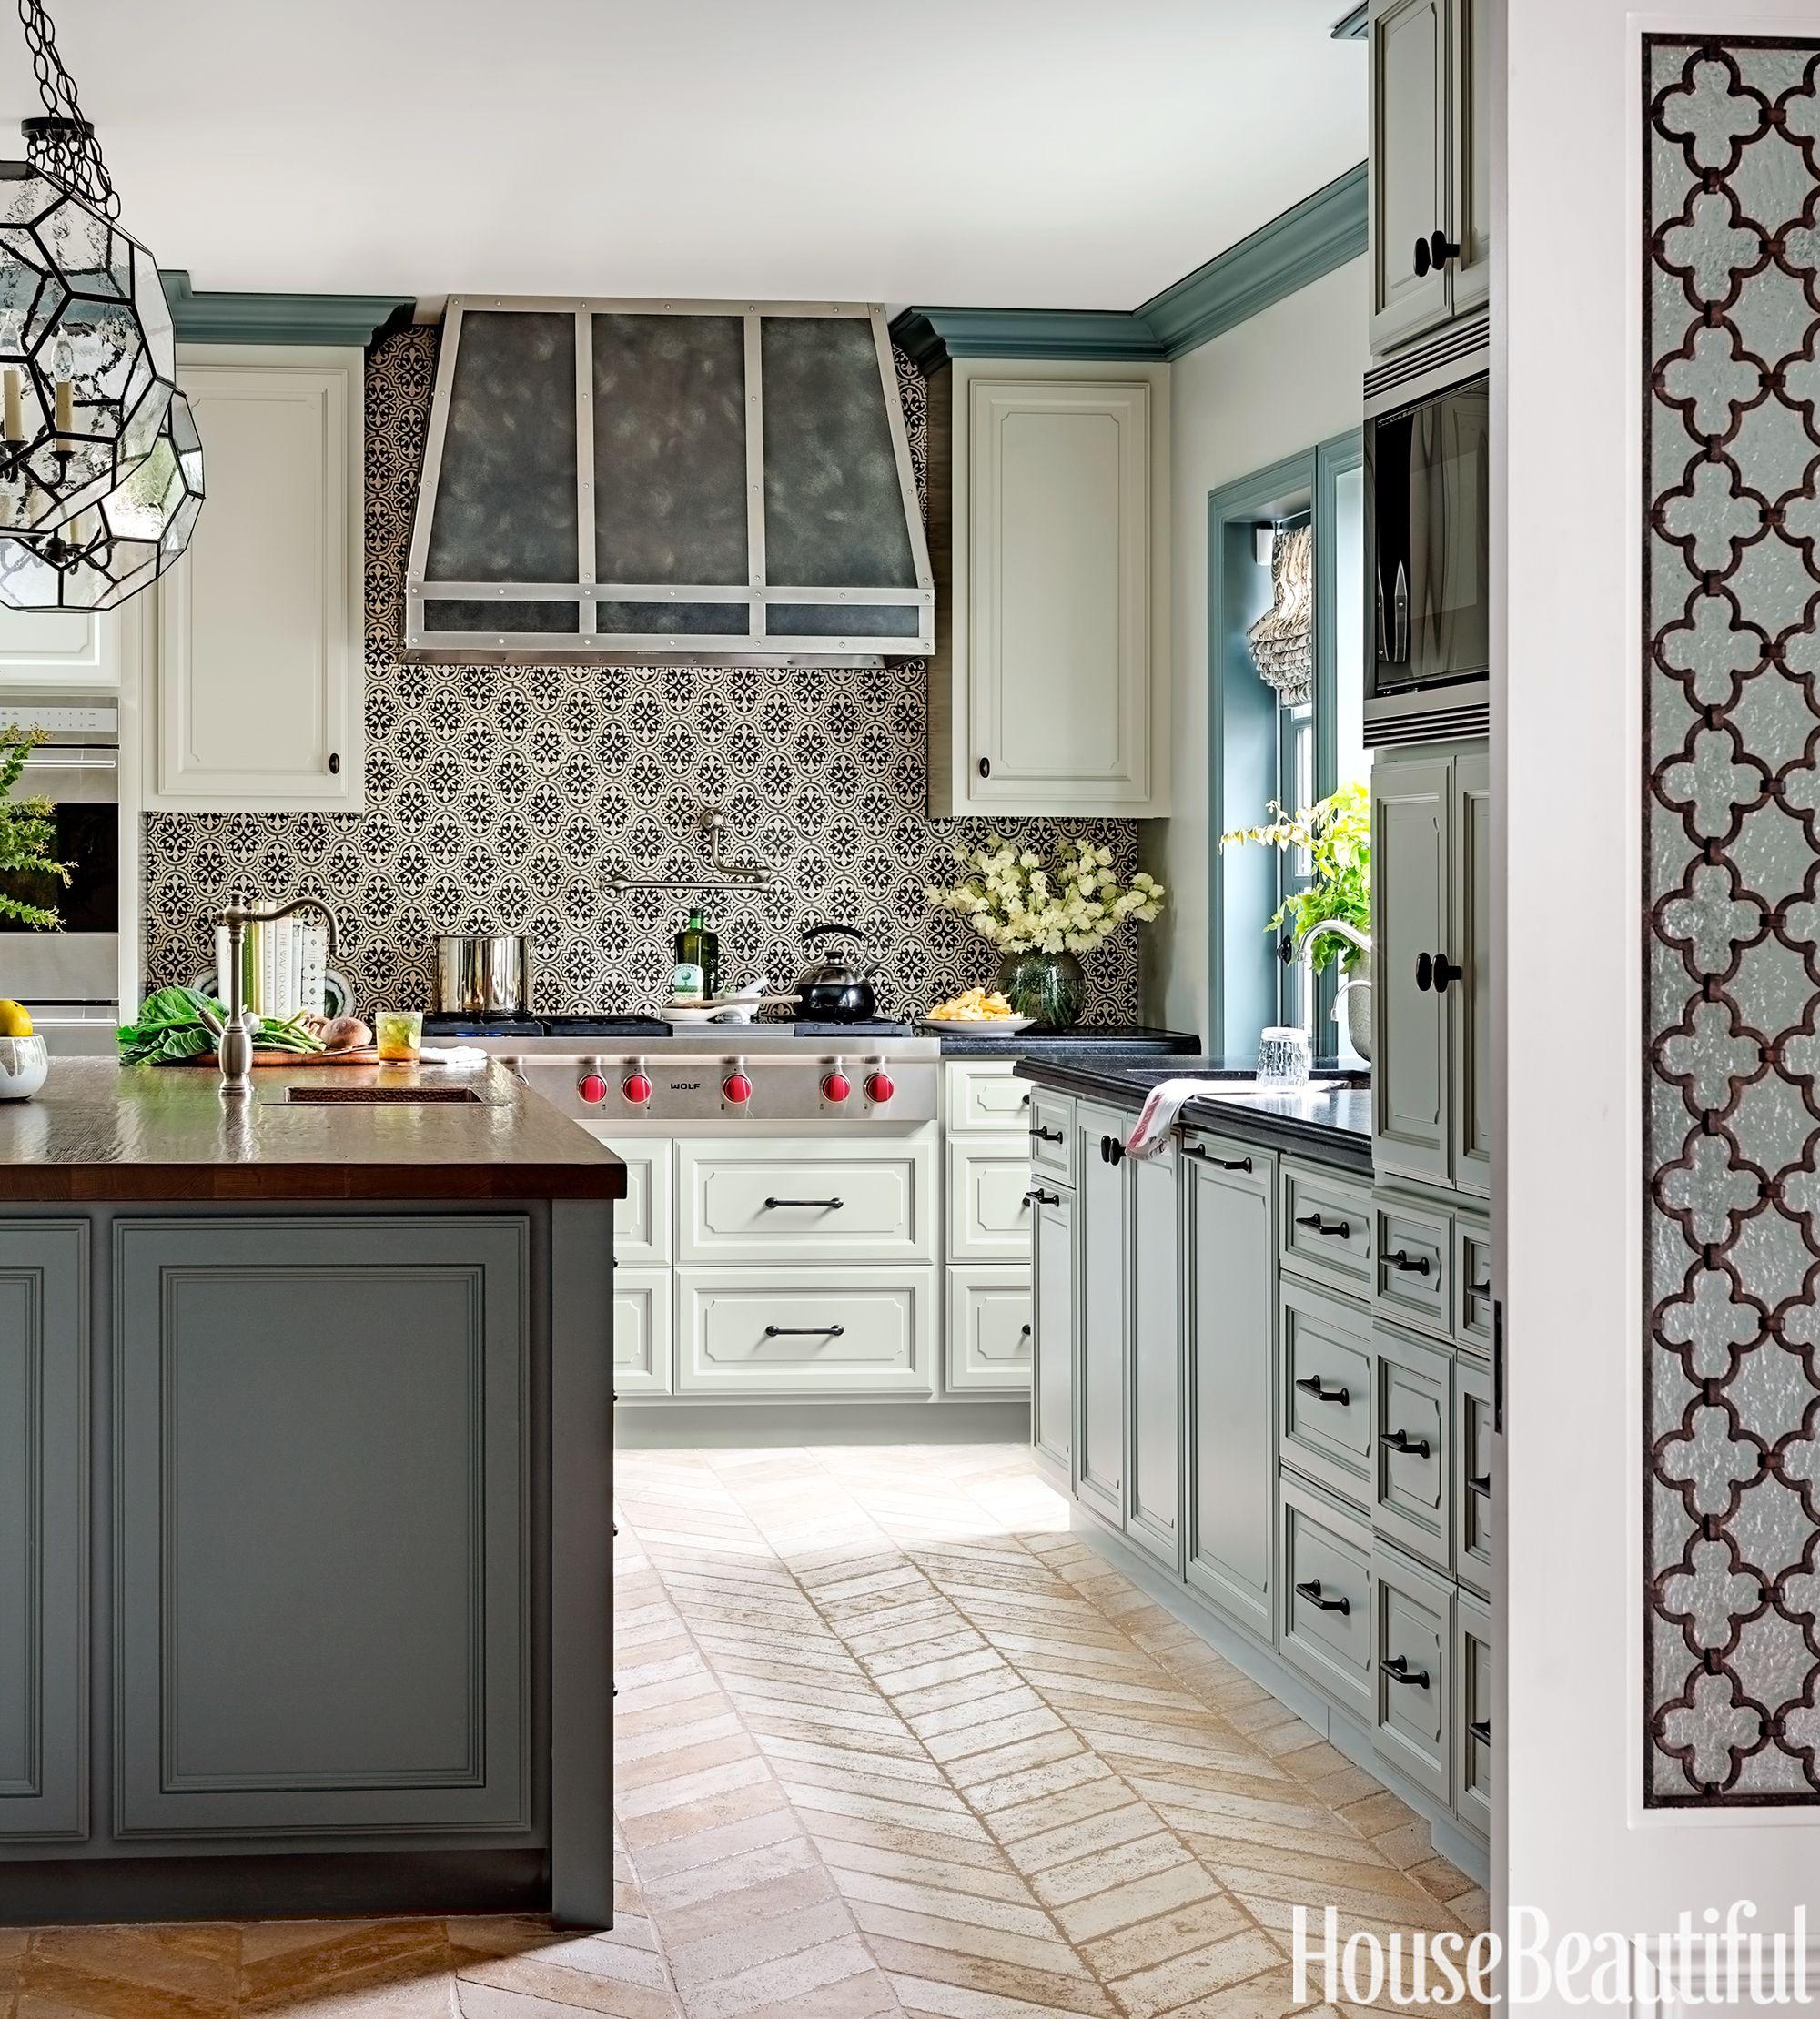 Kitchen back wall tile best kitchen back wall ideas - tile designs for kitchen back walls LVIEHVW